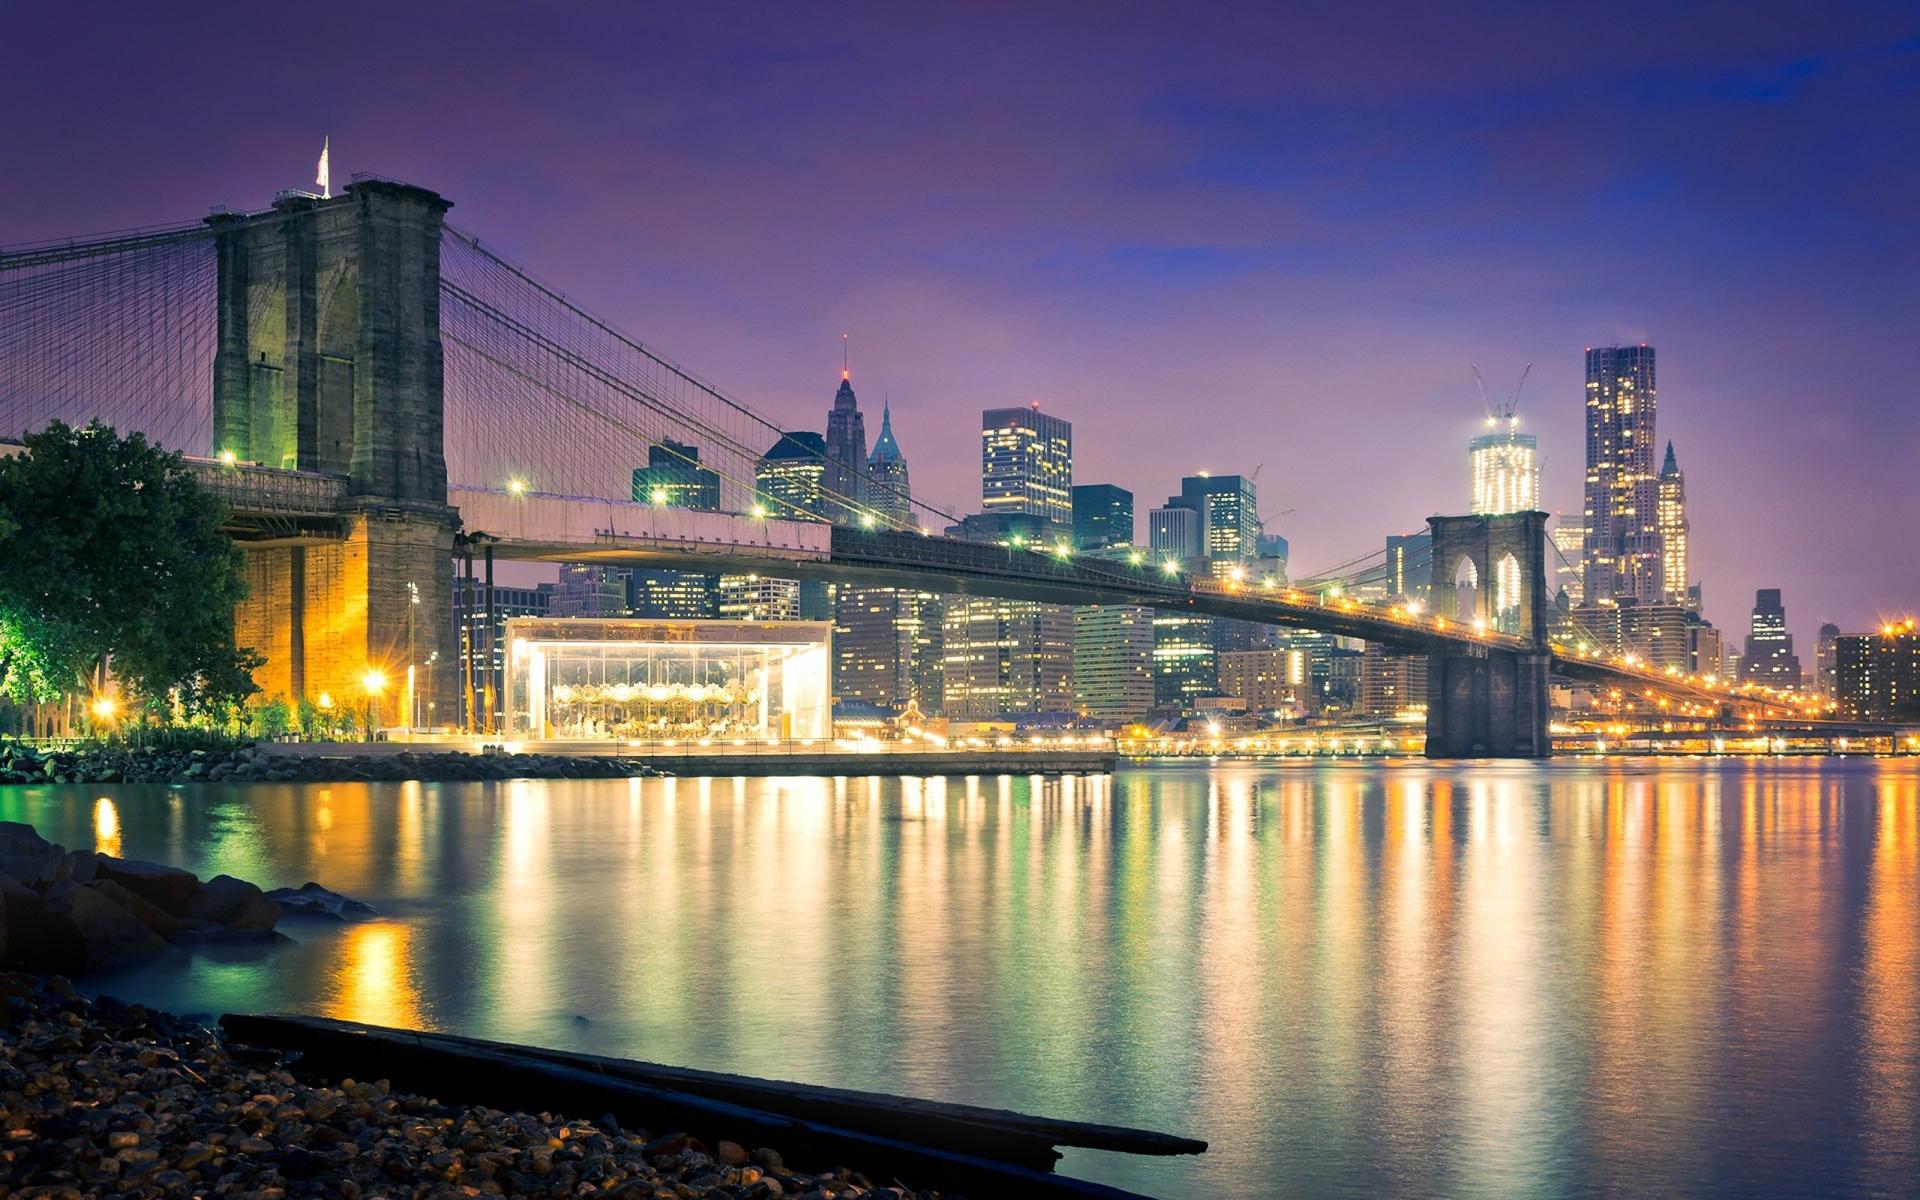 Brooklyn Bridge Bridge New York Buildings Skyscrapers Ocean Night 1920x1200